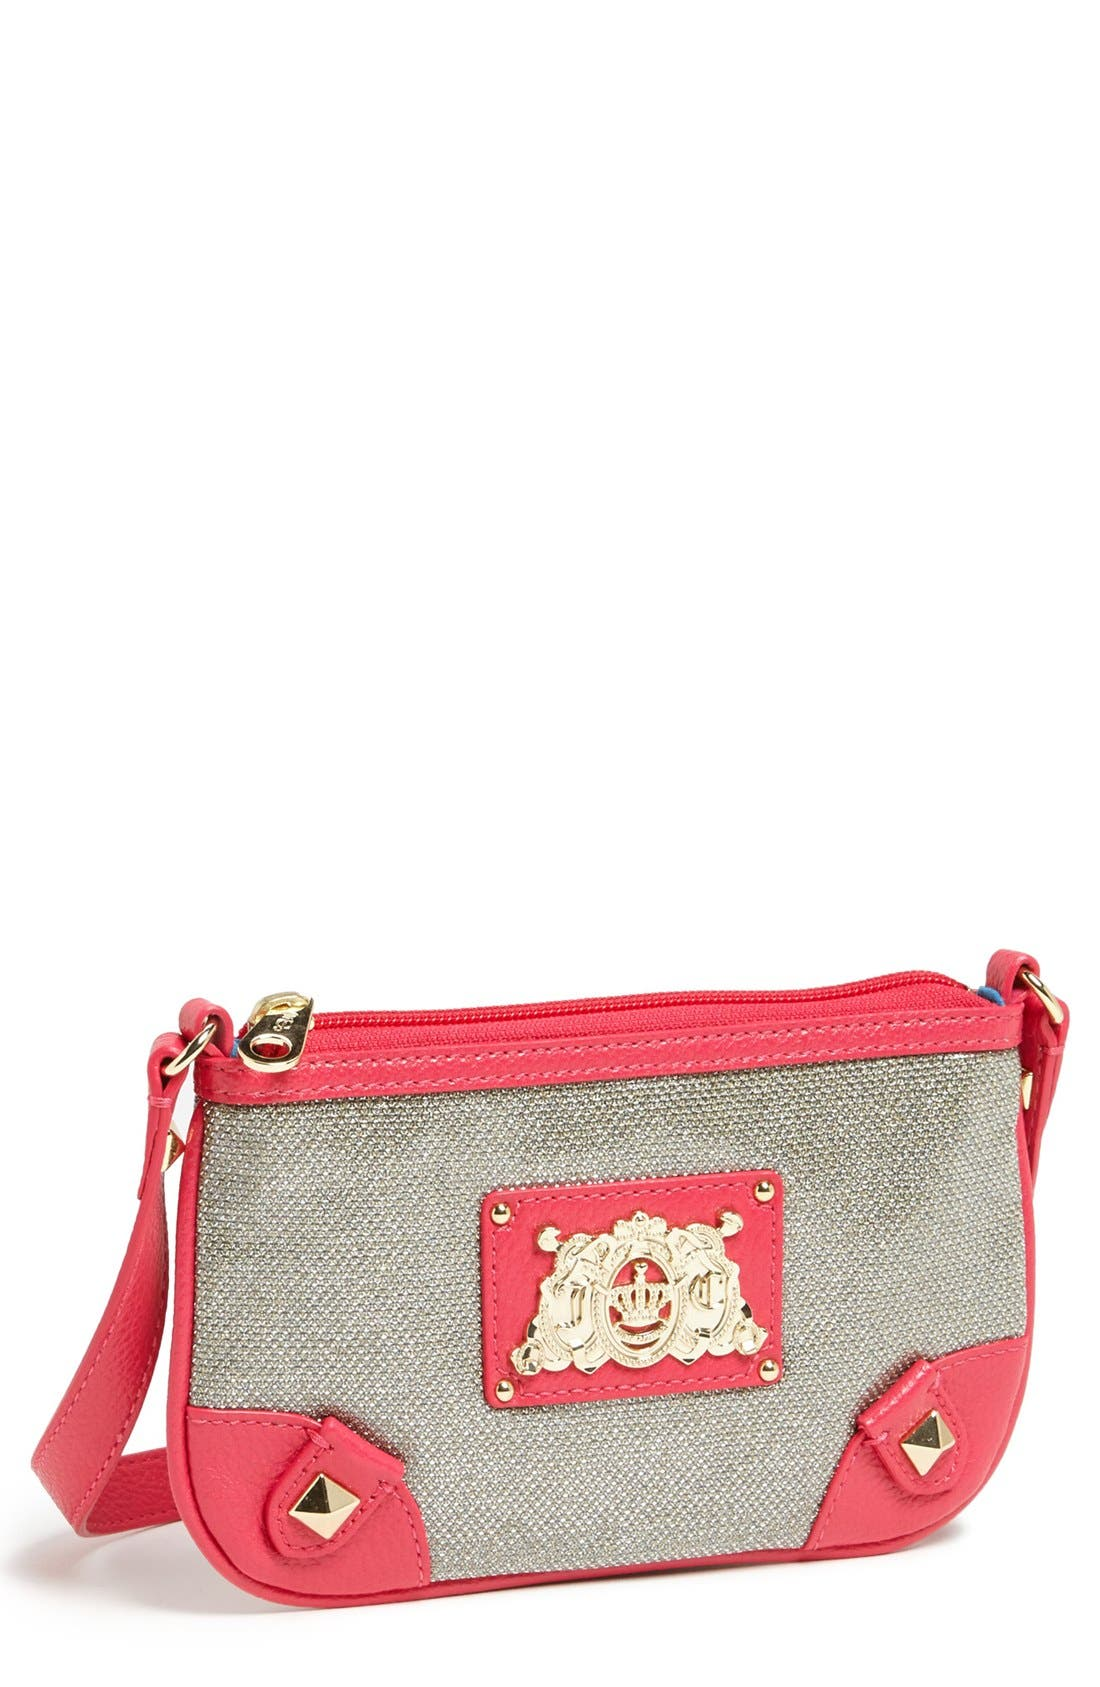 Main Image - Juicy Couture 'Bright Diamond' Crossbody Bag (Girls)